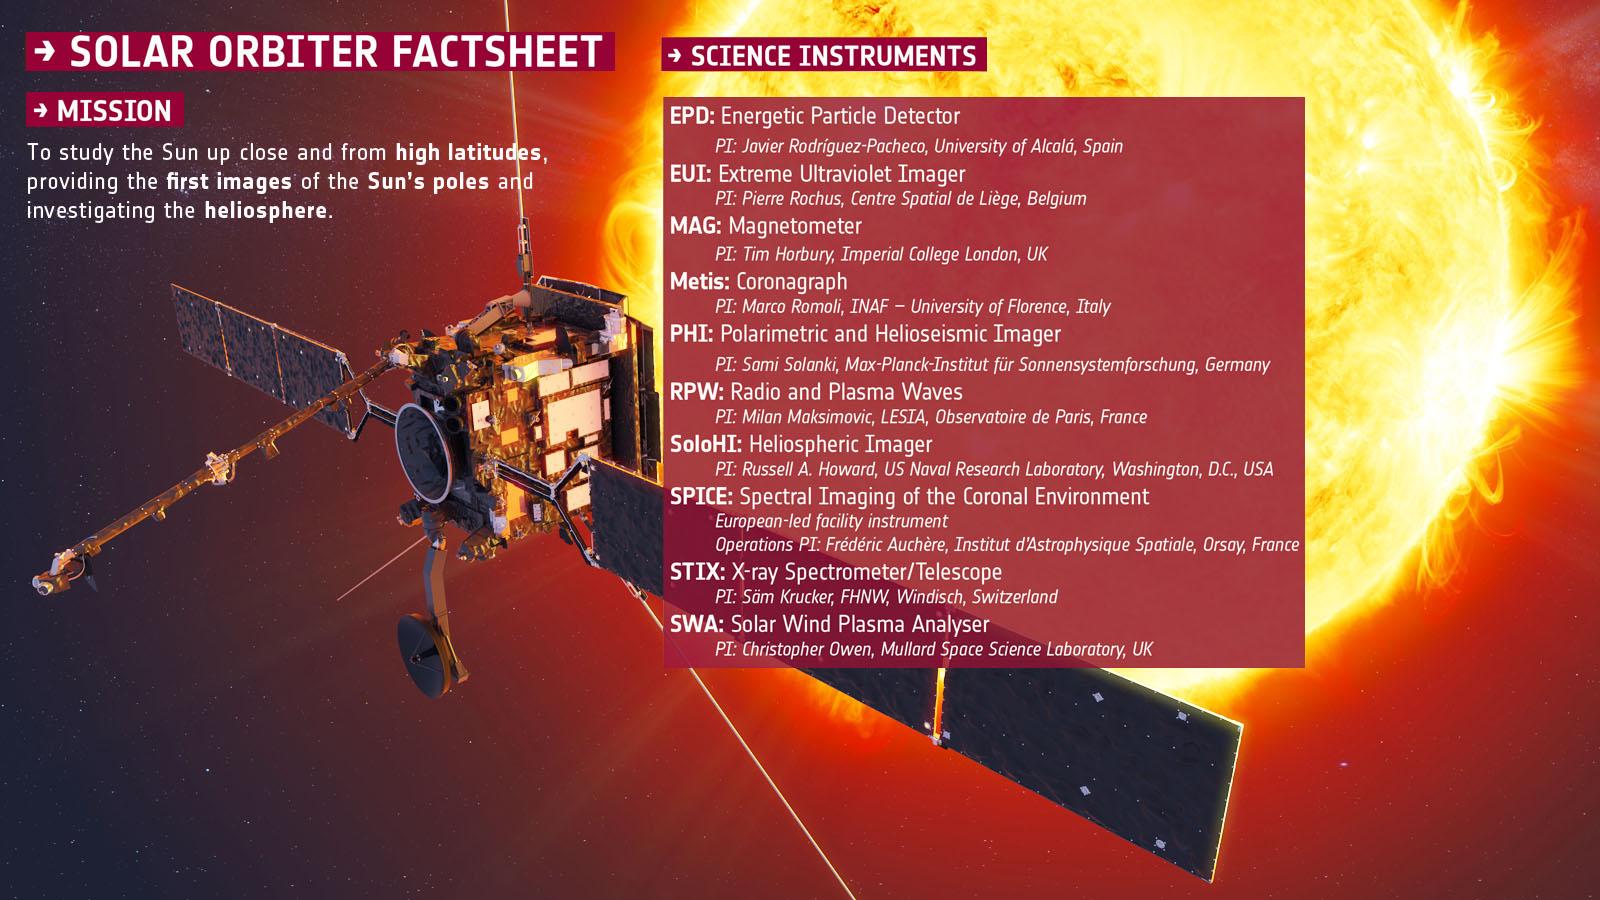 NASA's Solar Orbiter is on its way to observe the Sun's poles